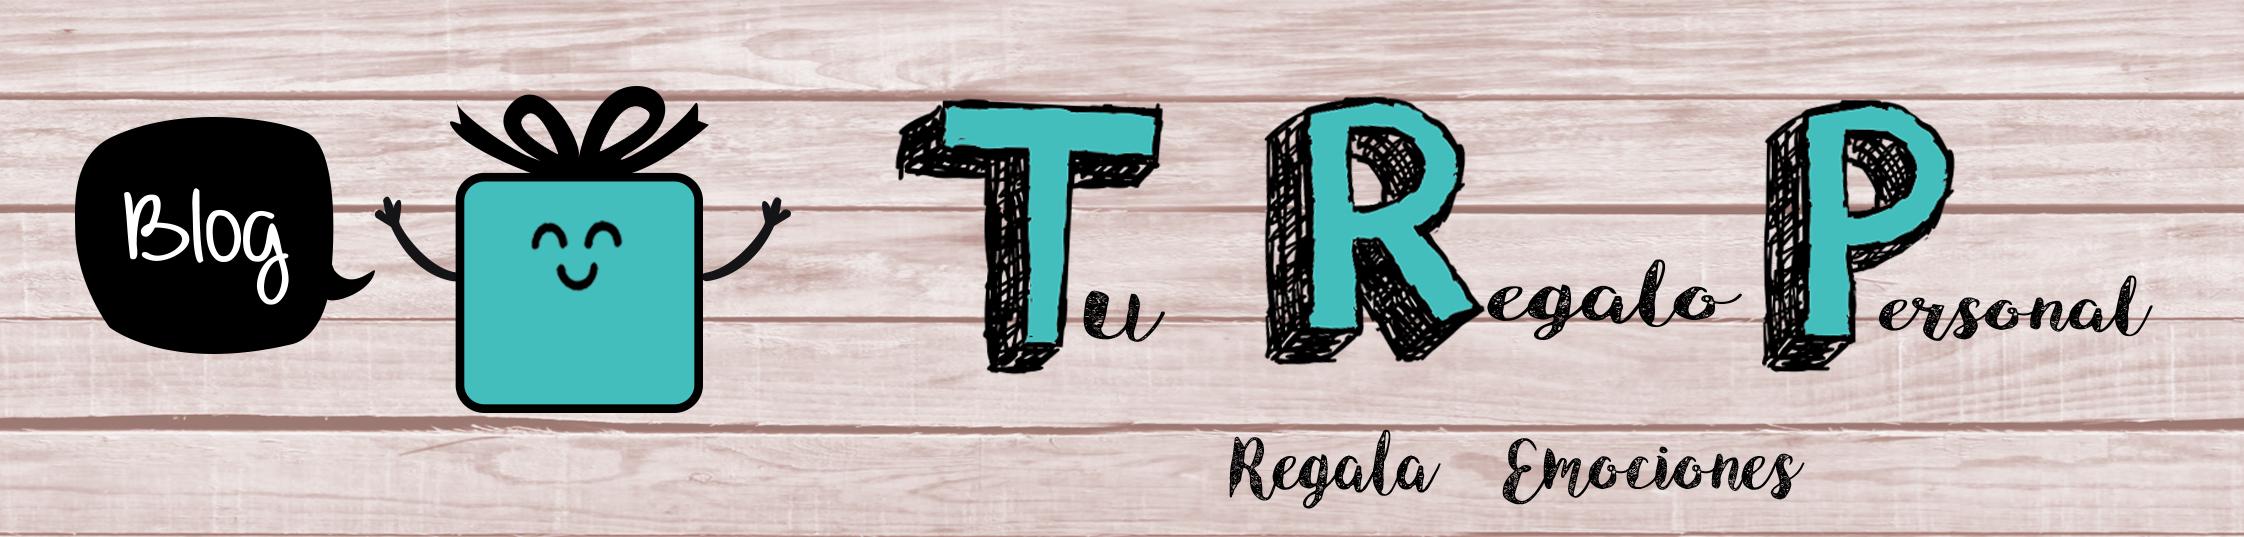 blog-trp